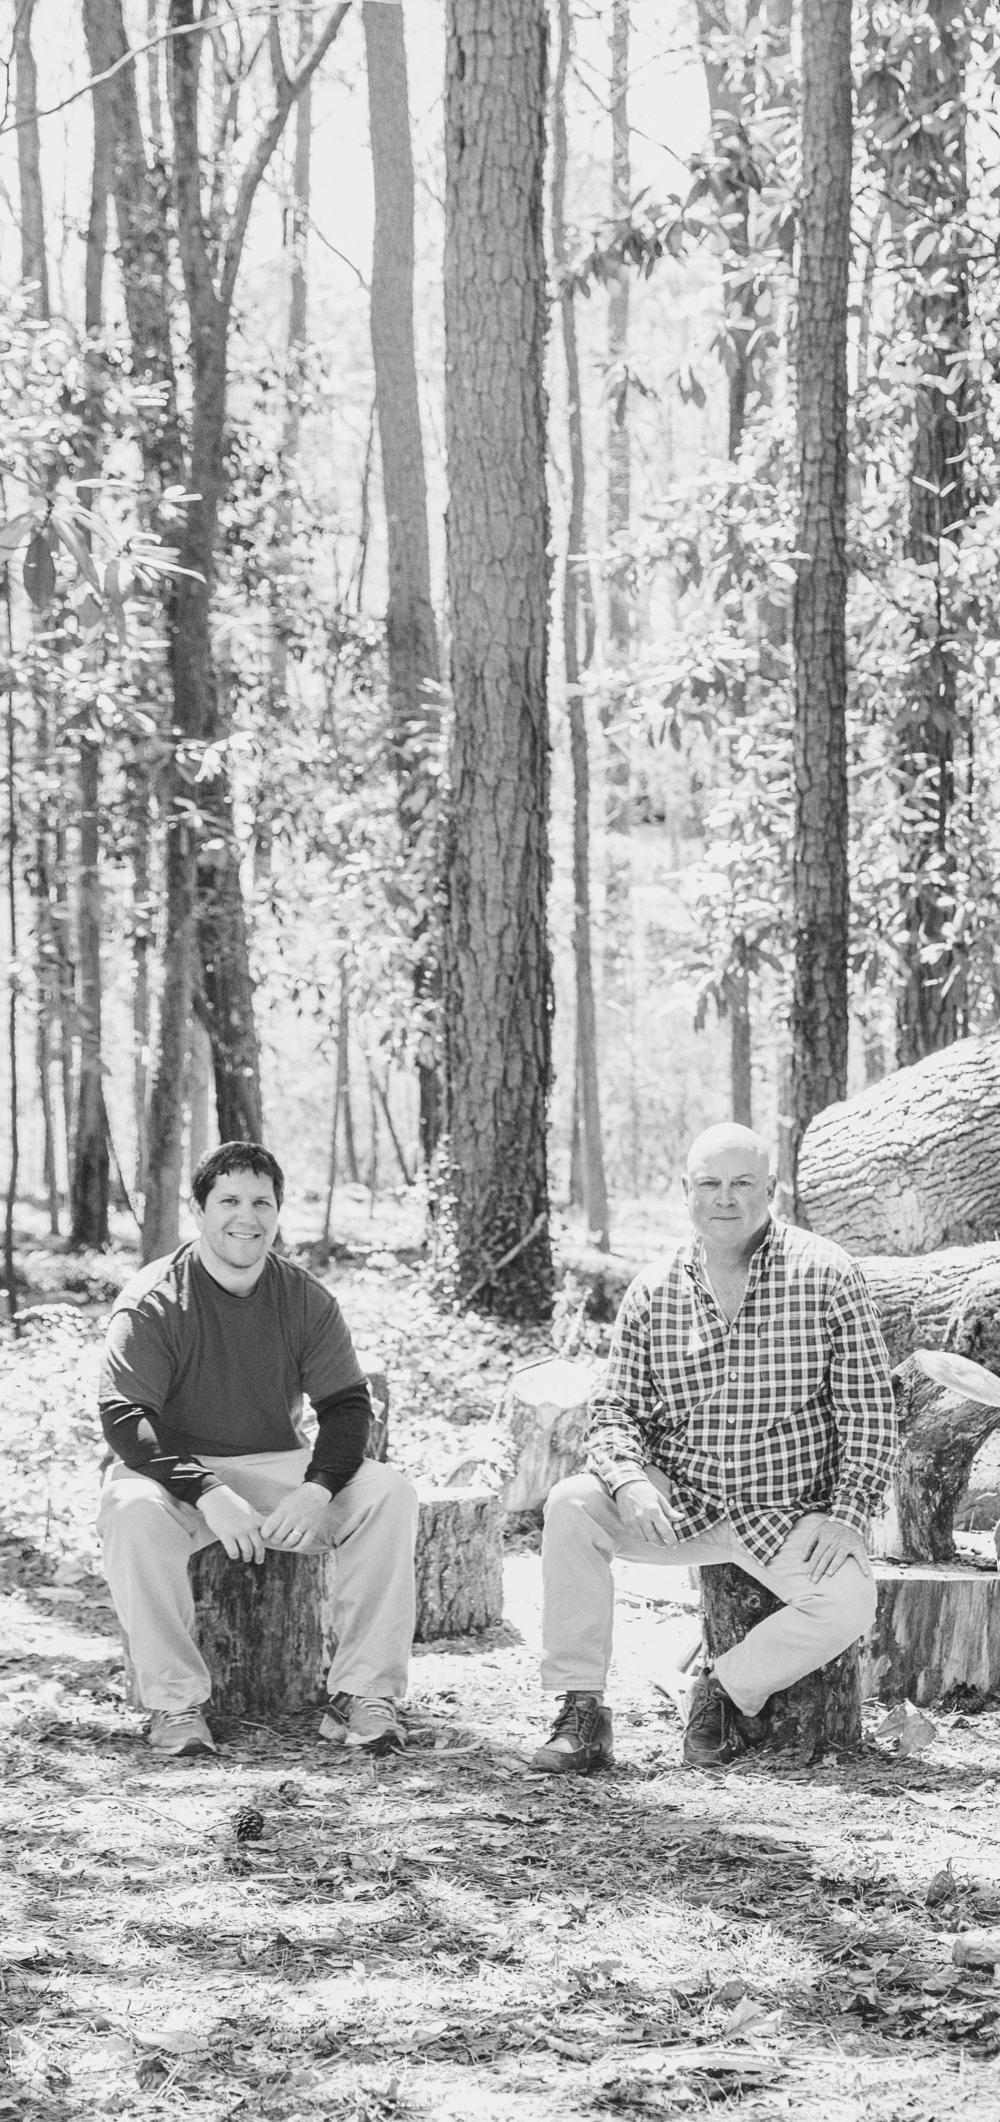 gentlemen of woodkith